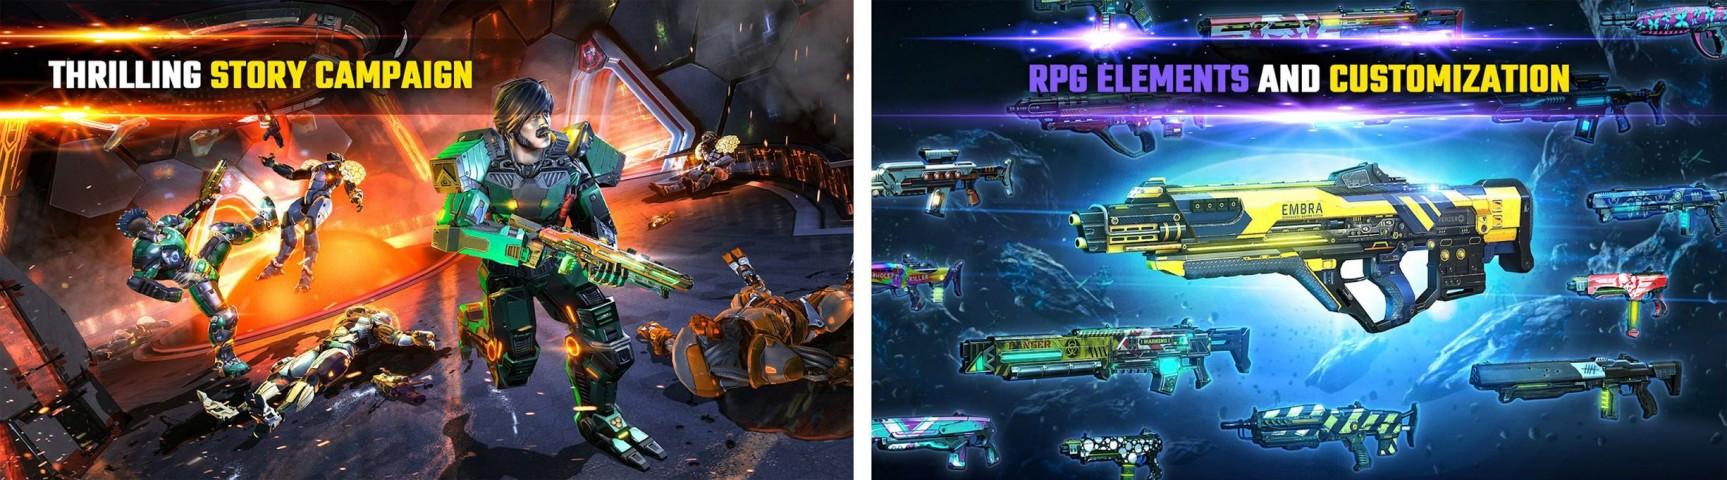 shadowgun-legends-apk-download.jpg